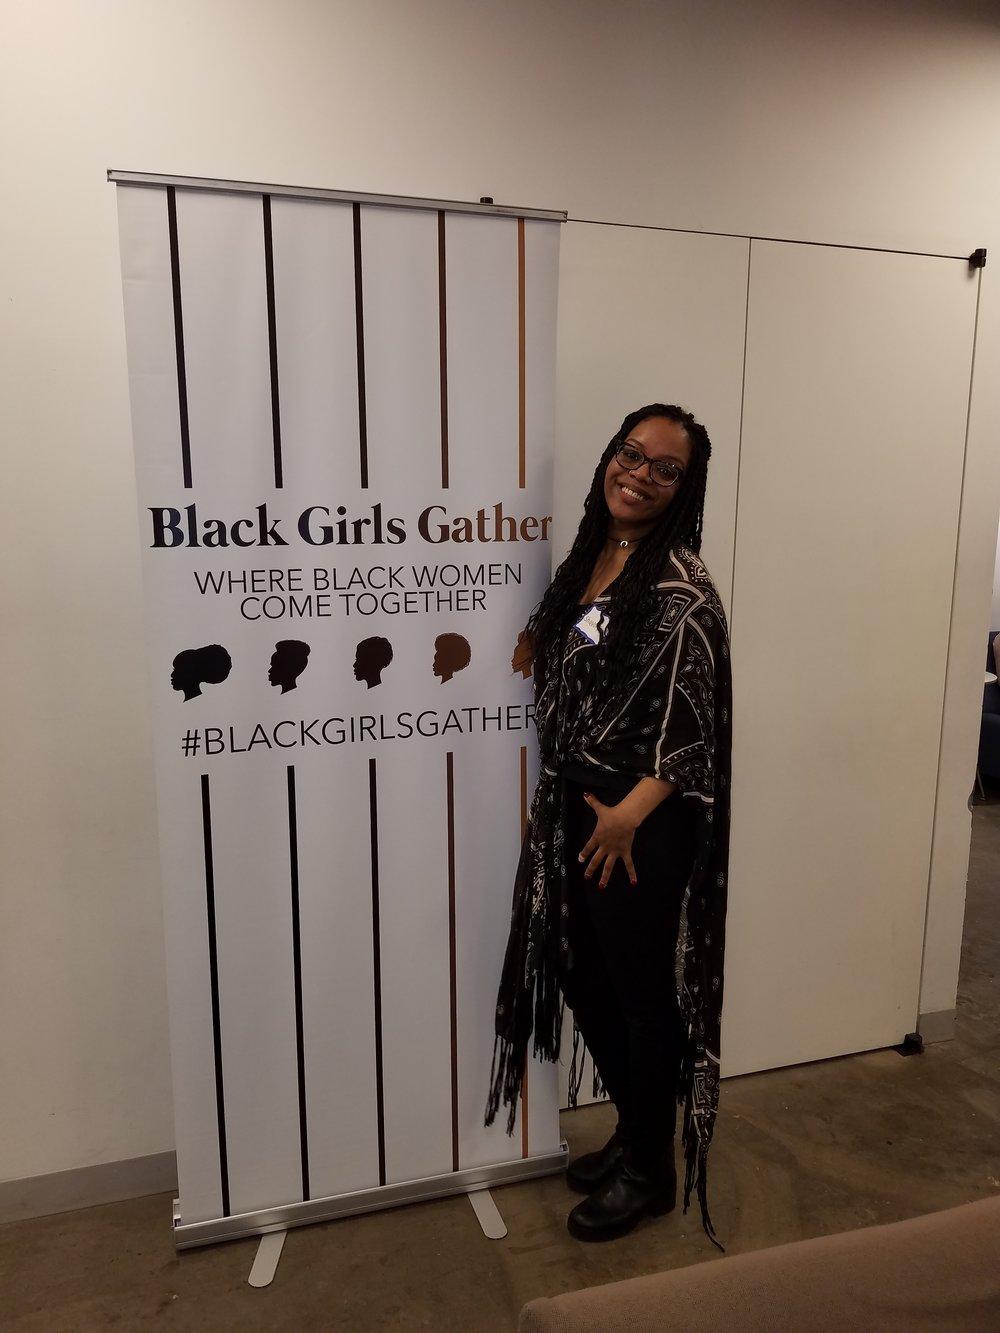 Volunteering at #BlackGirlsGather